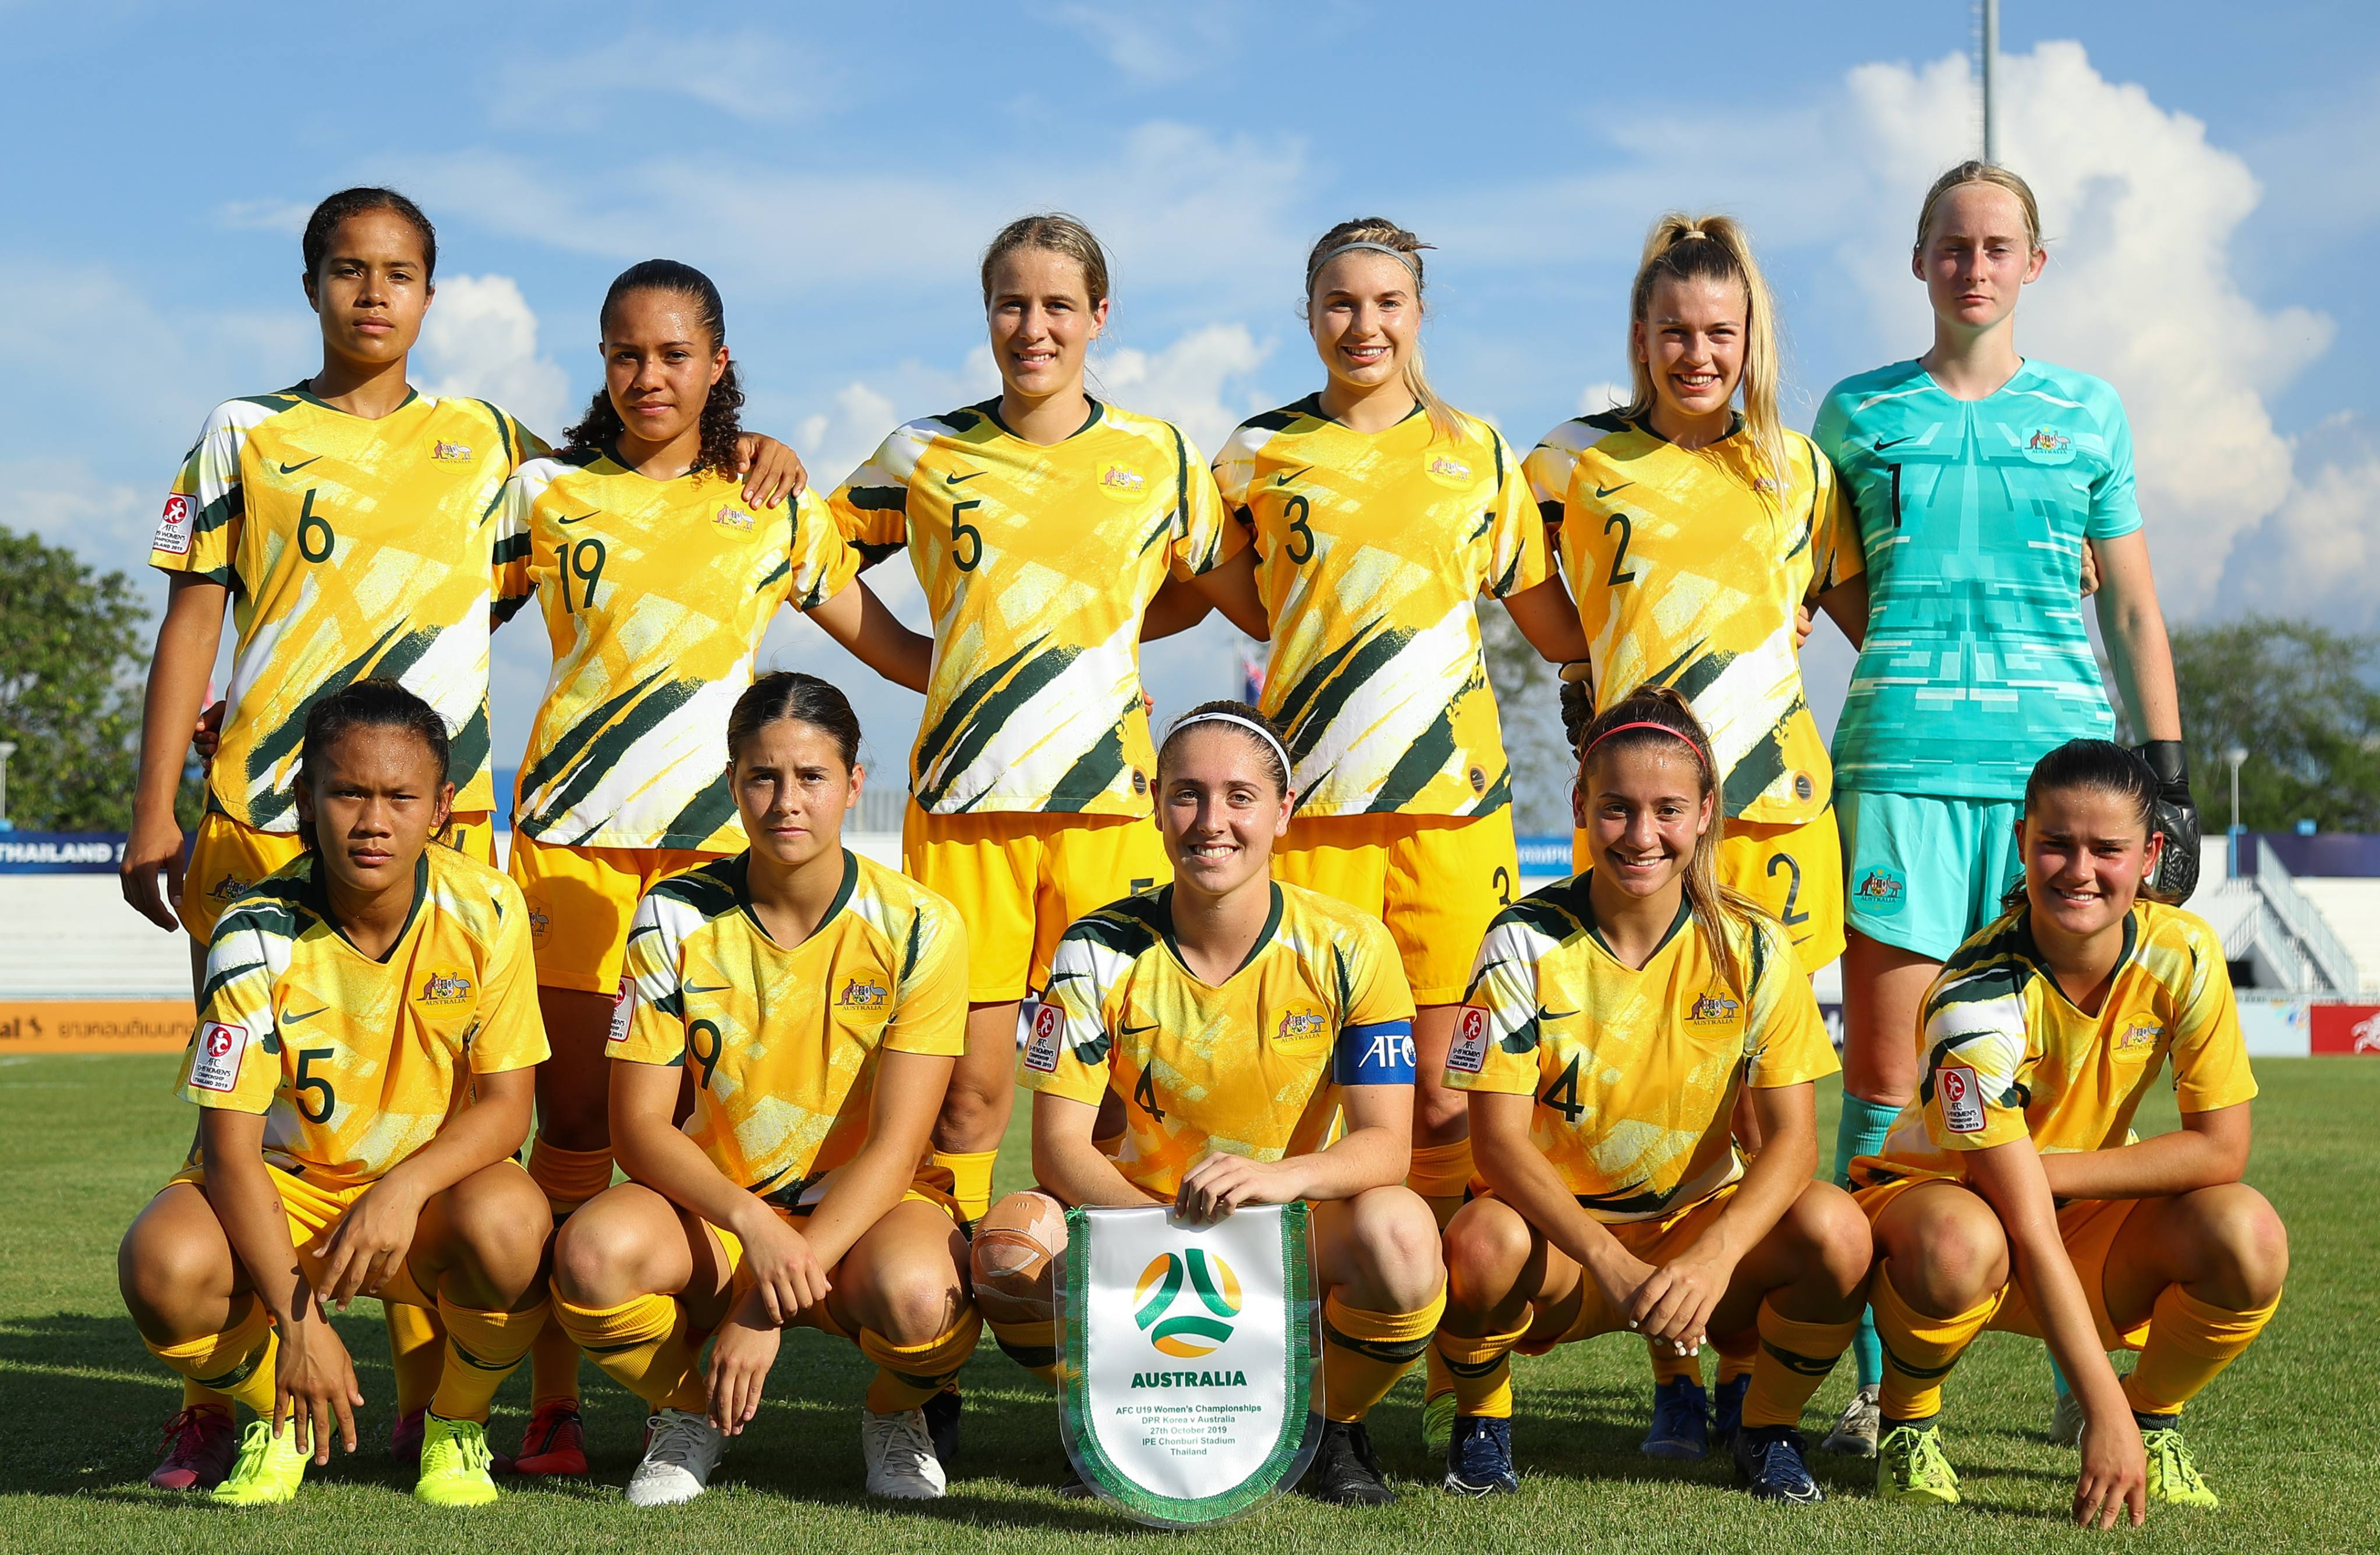 Westfield Young Matildas / AFC